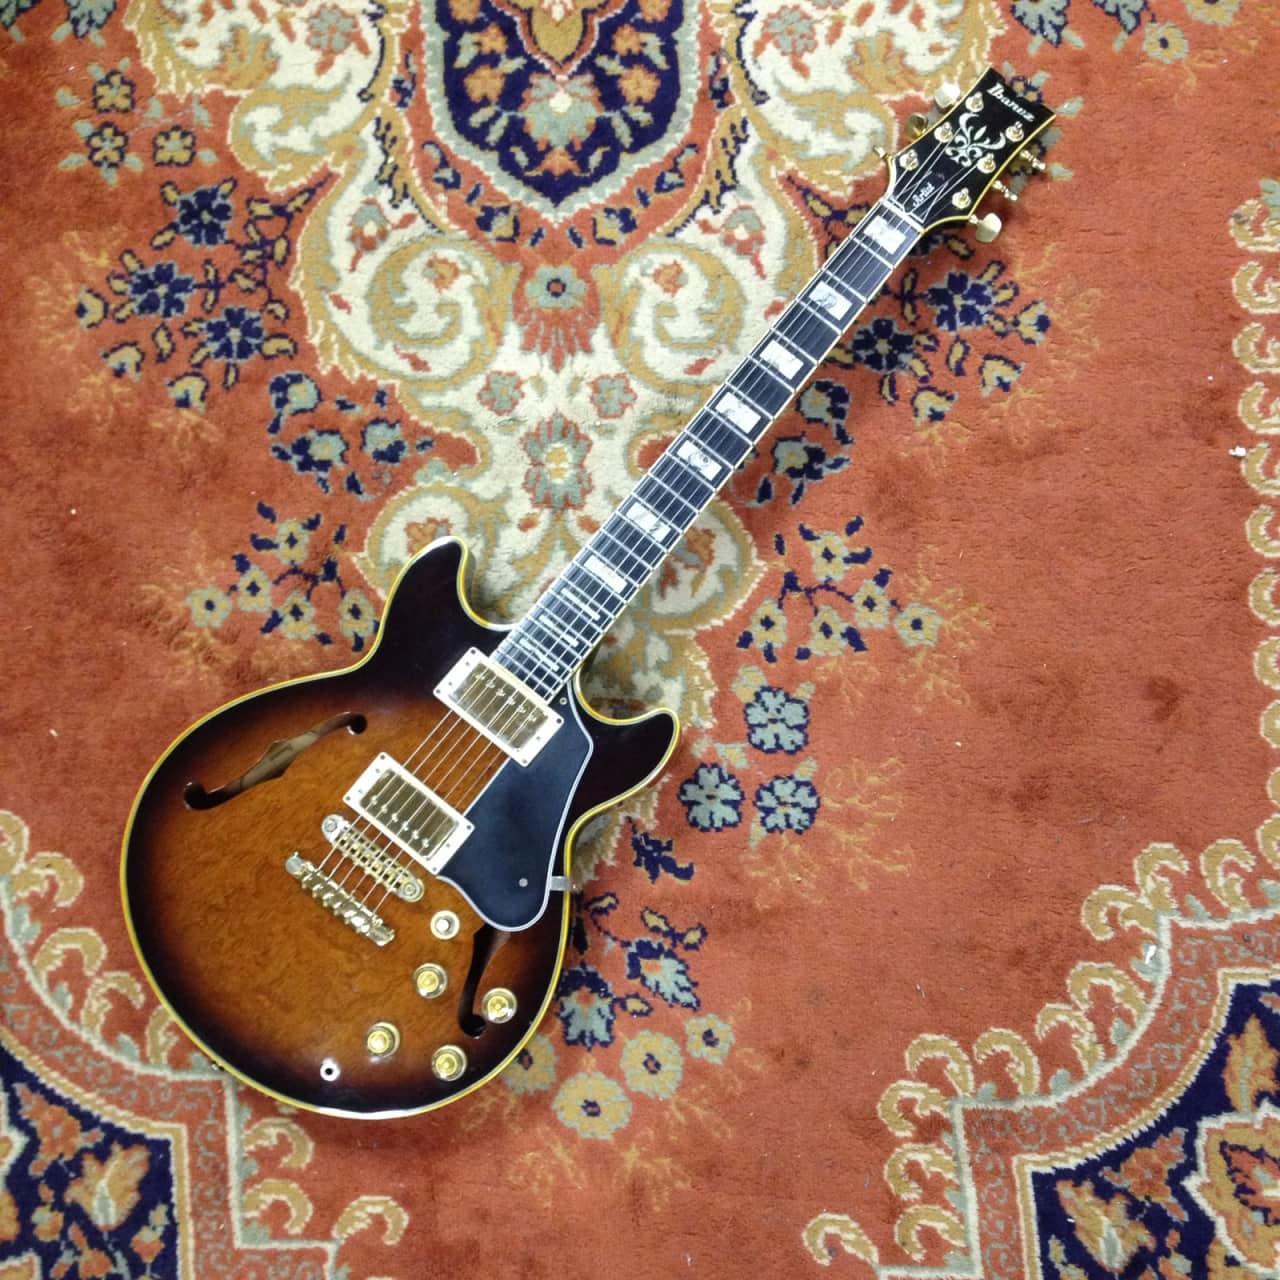 ibanez artist am 205 semi hollow body electric guitar reverb. Black Bedroom Furniture Sets. Home Design Ideas